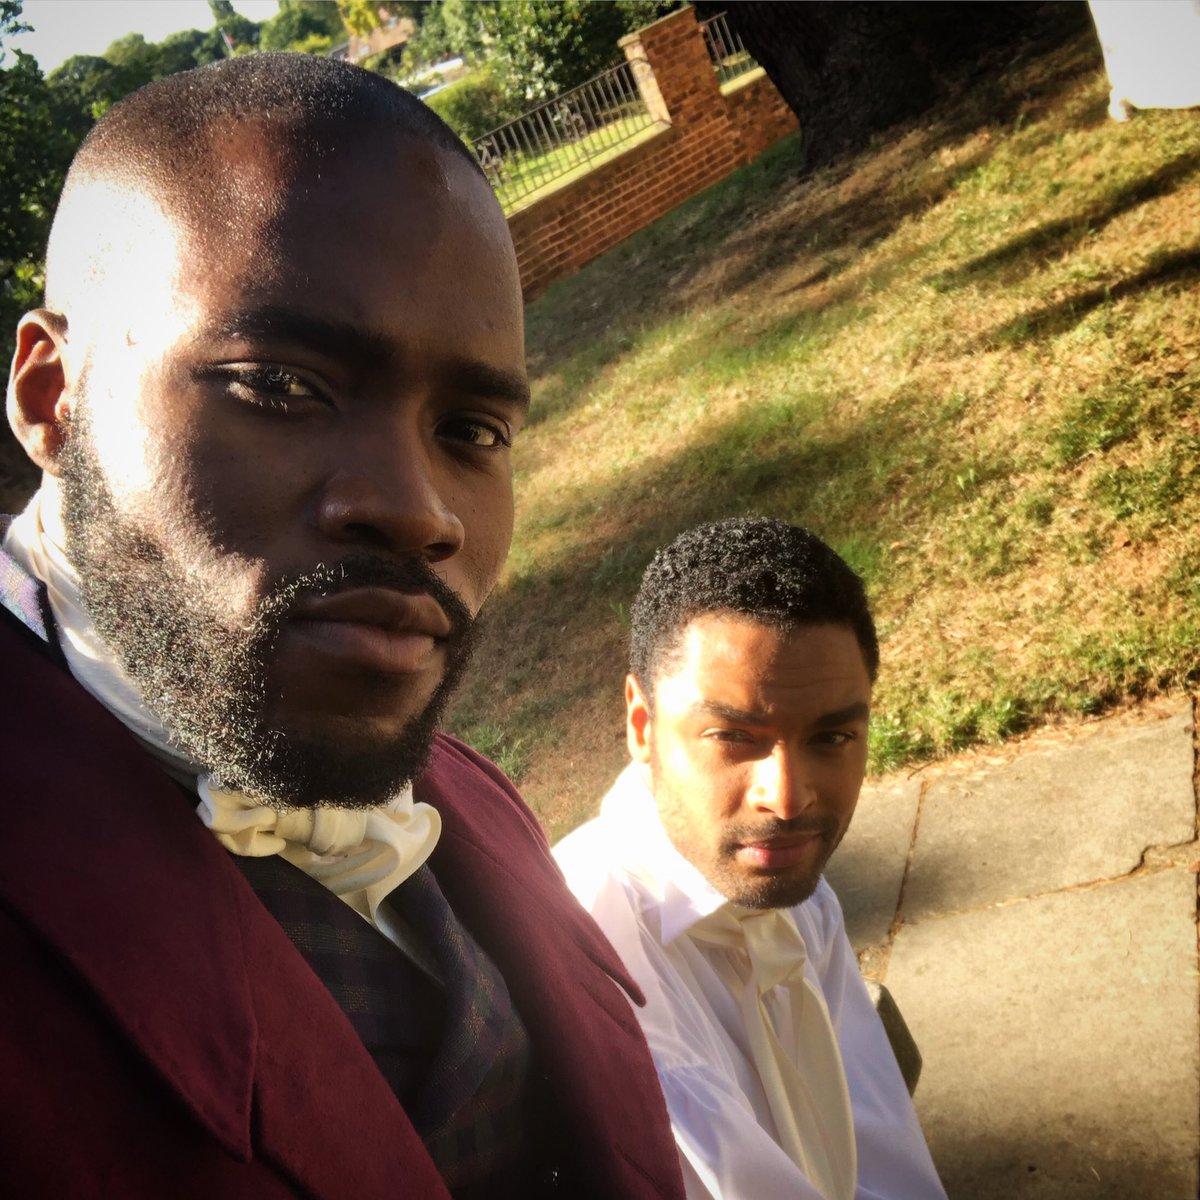 Replying to @MartinsImhangbe: Bromance Chronicles ✊🏾😄 #bridgertonnetflix